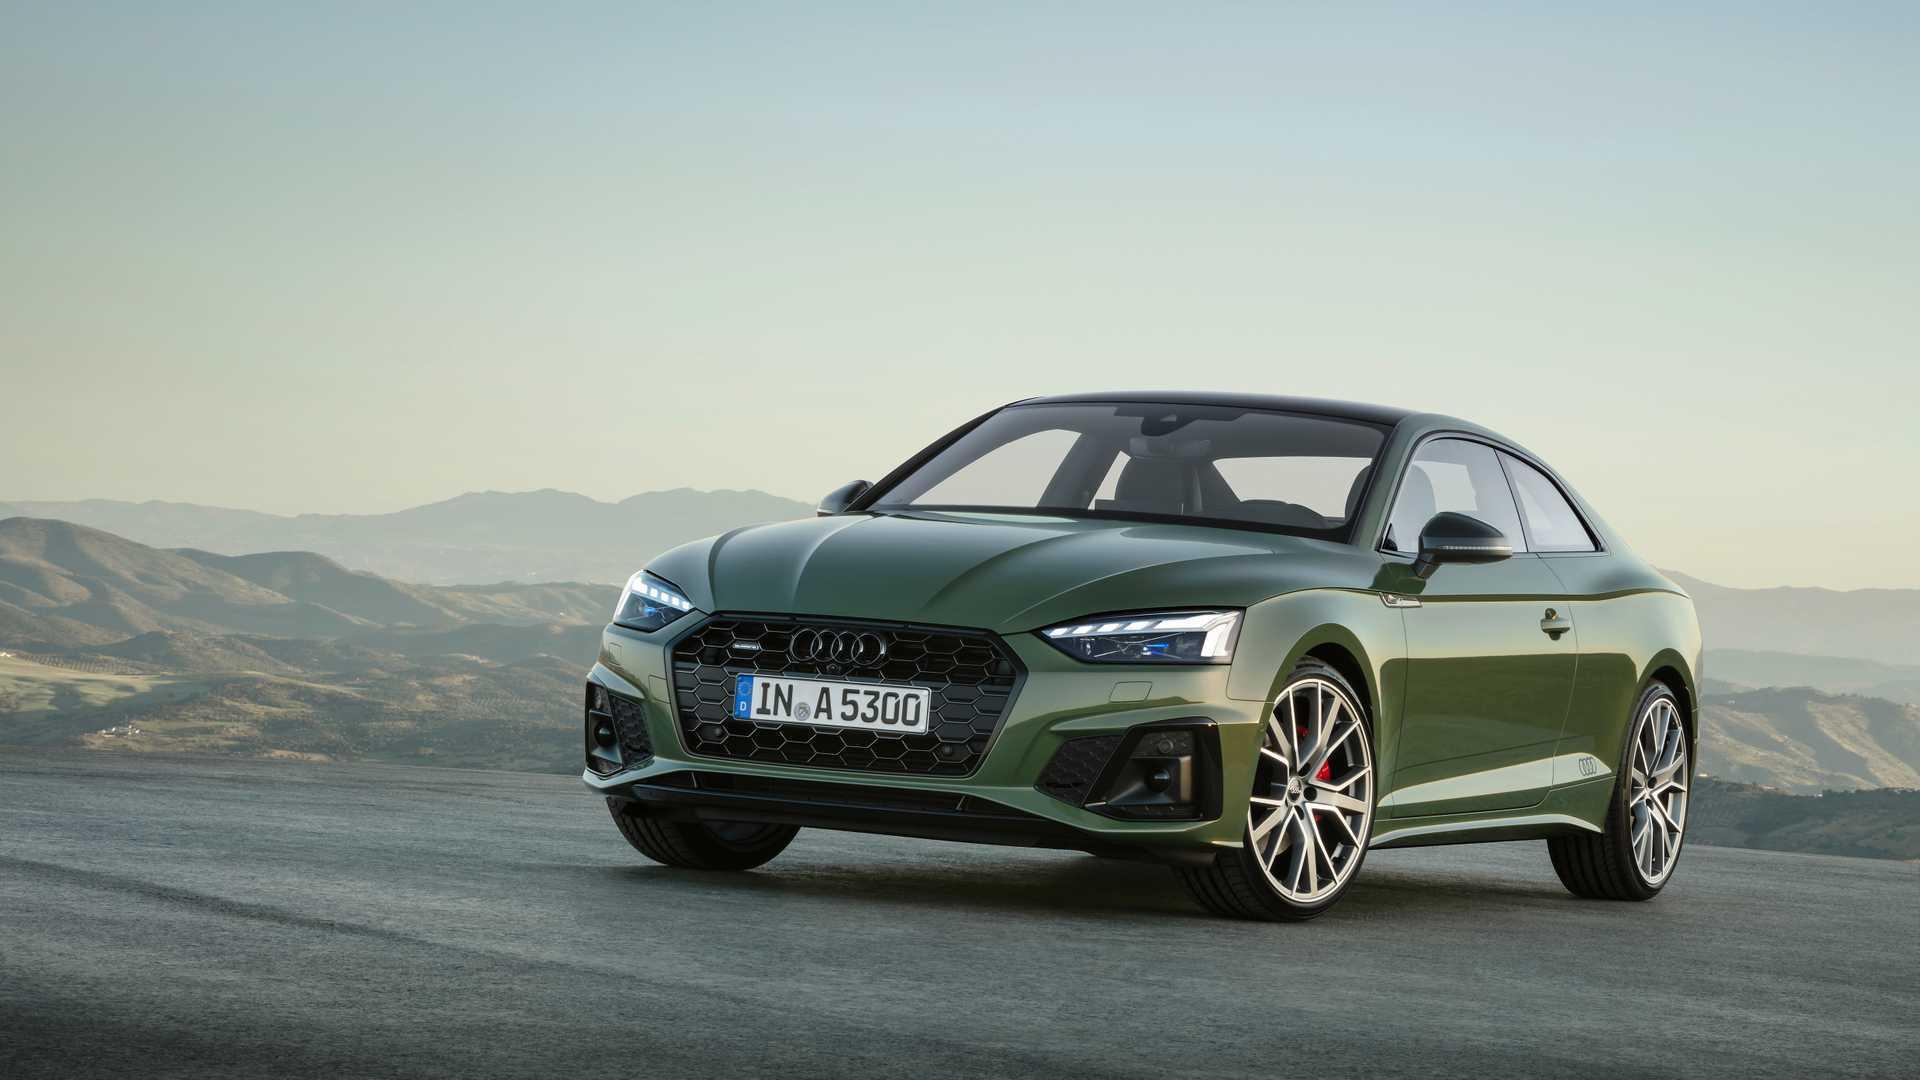 2020 Audi A5 Debuts Subtle Facelift, S5 Gets Diesel In Europe